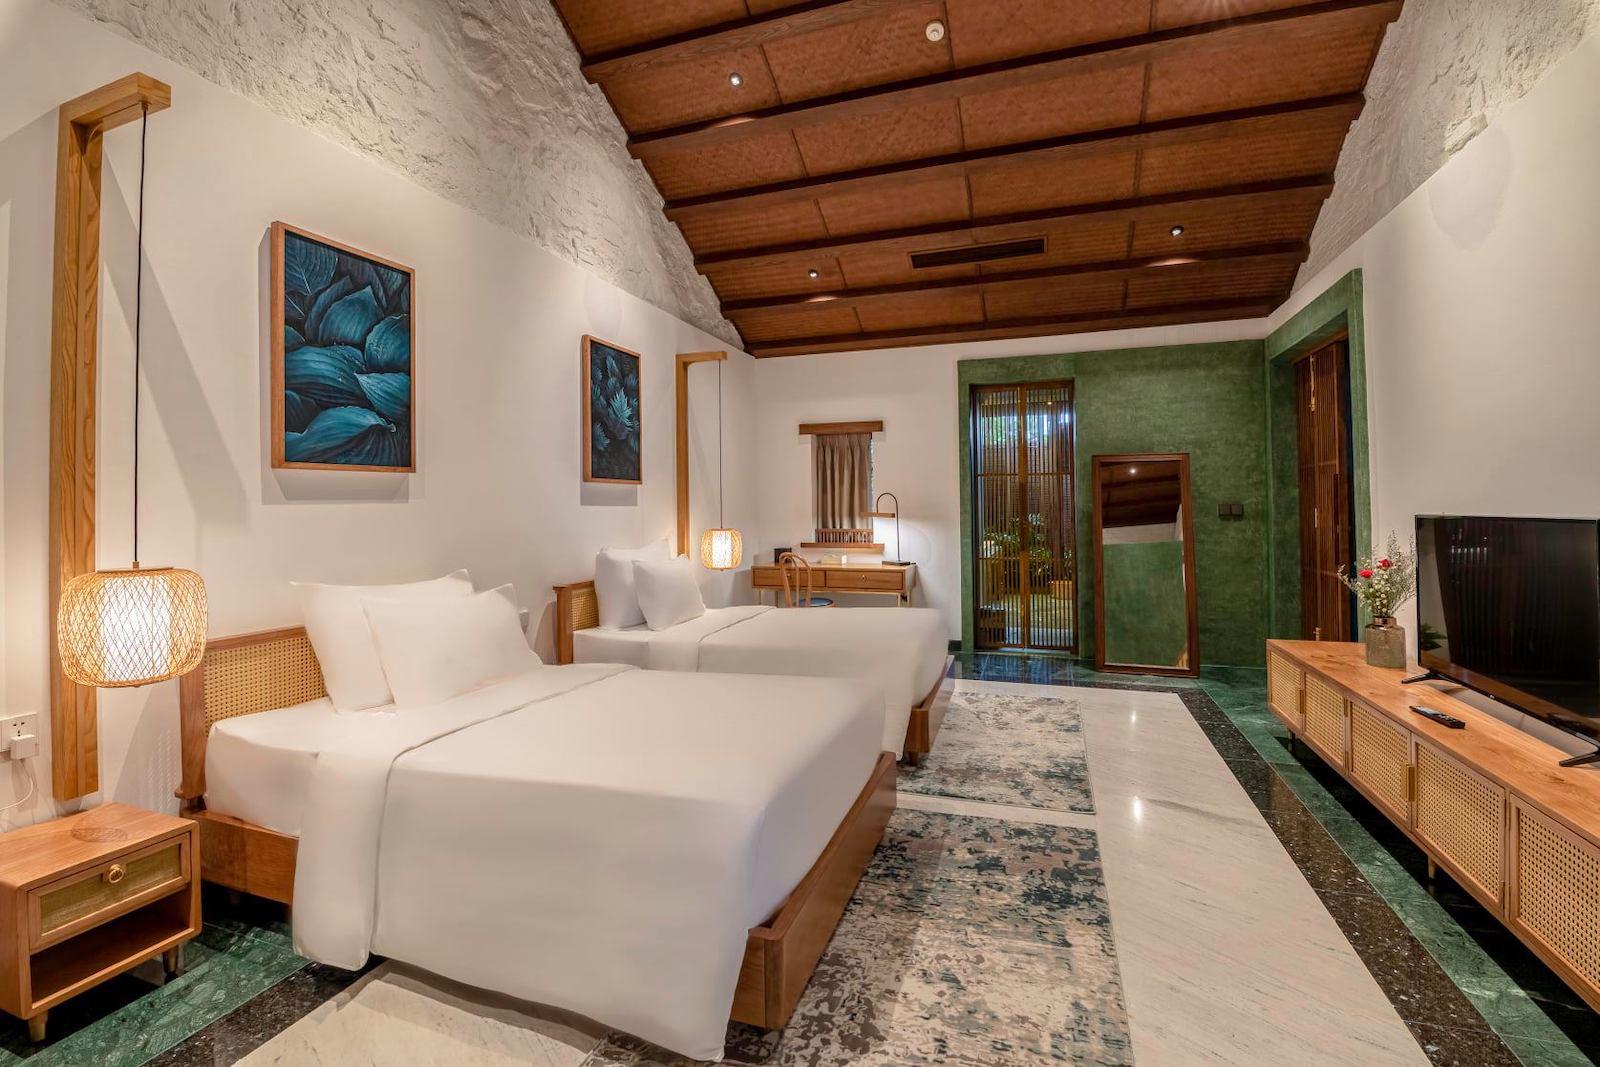 Image of The Secret Con Dao room in Vietnam